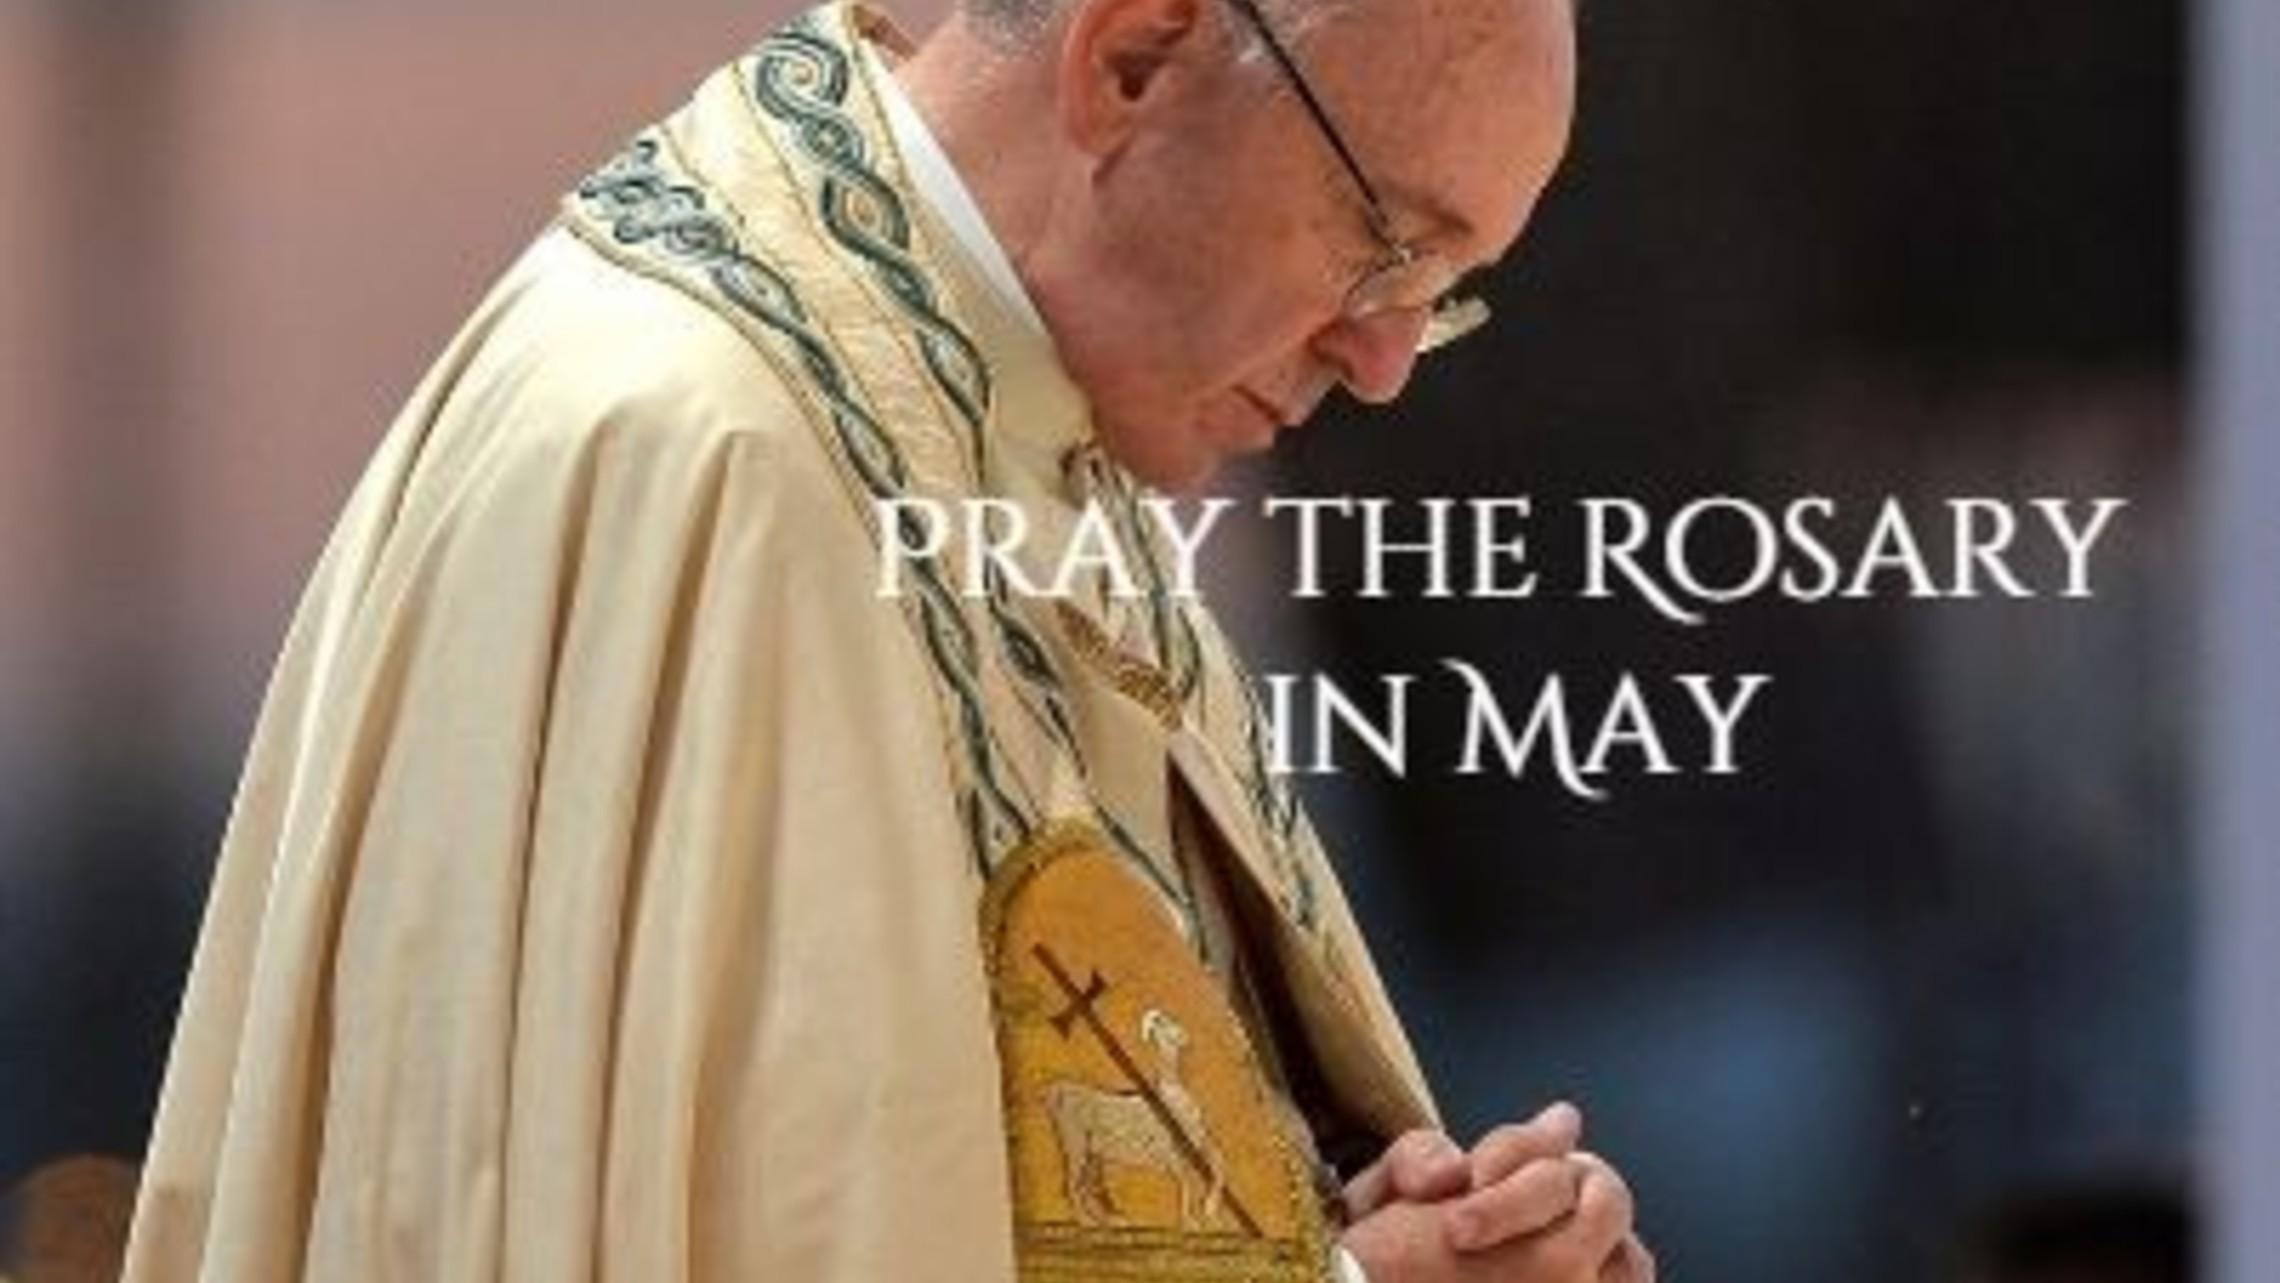 Pope Francis Prayer 1 1200x800 1 1140x641 1